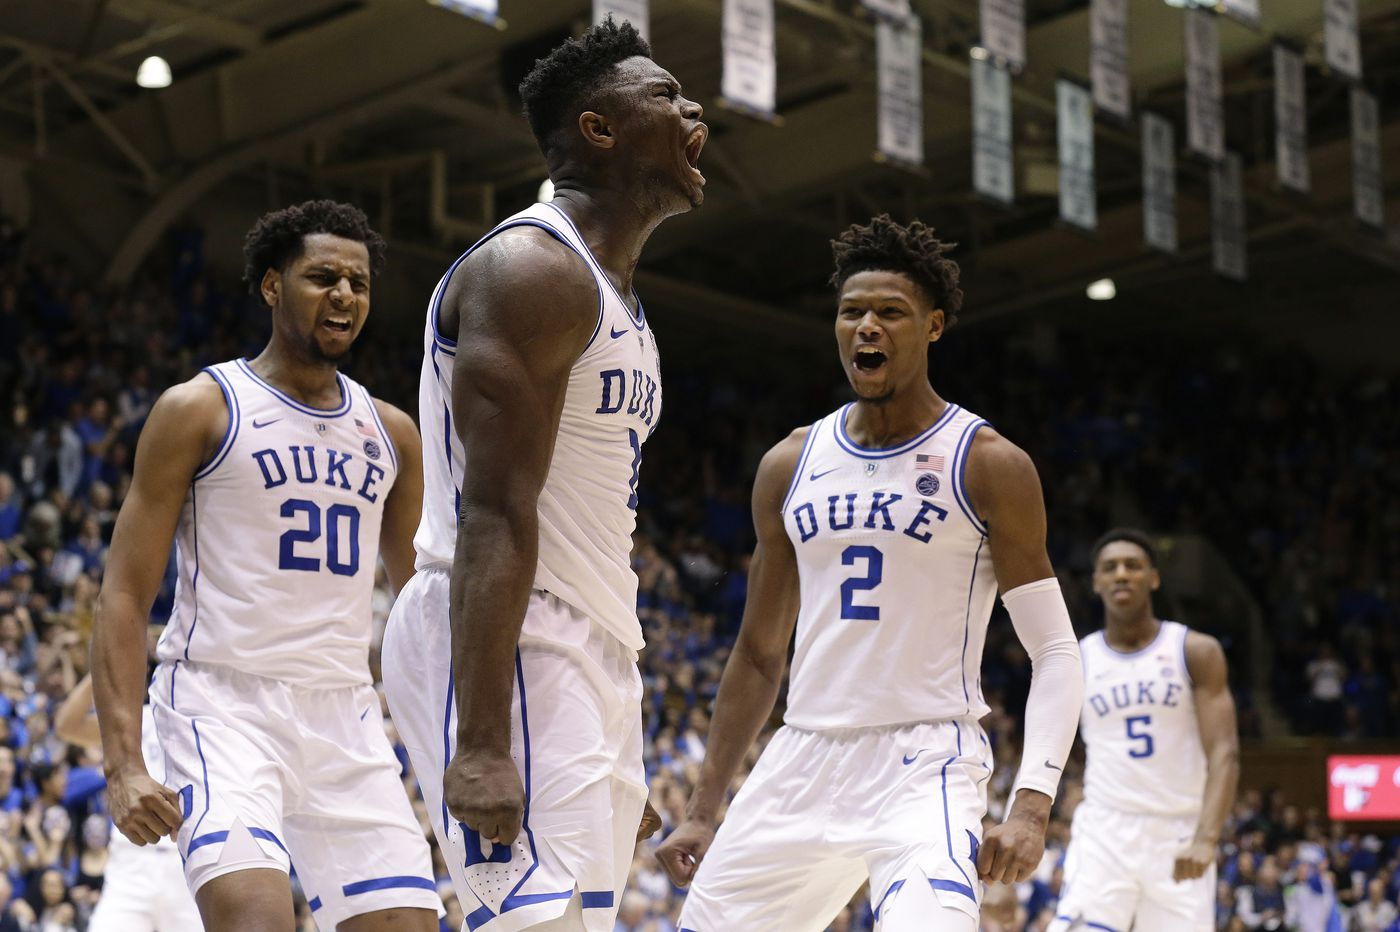 Westtown grad Cam Reddish a big part of Duke's win over Virginia | Mike Jensen